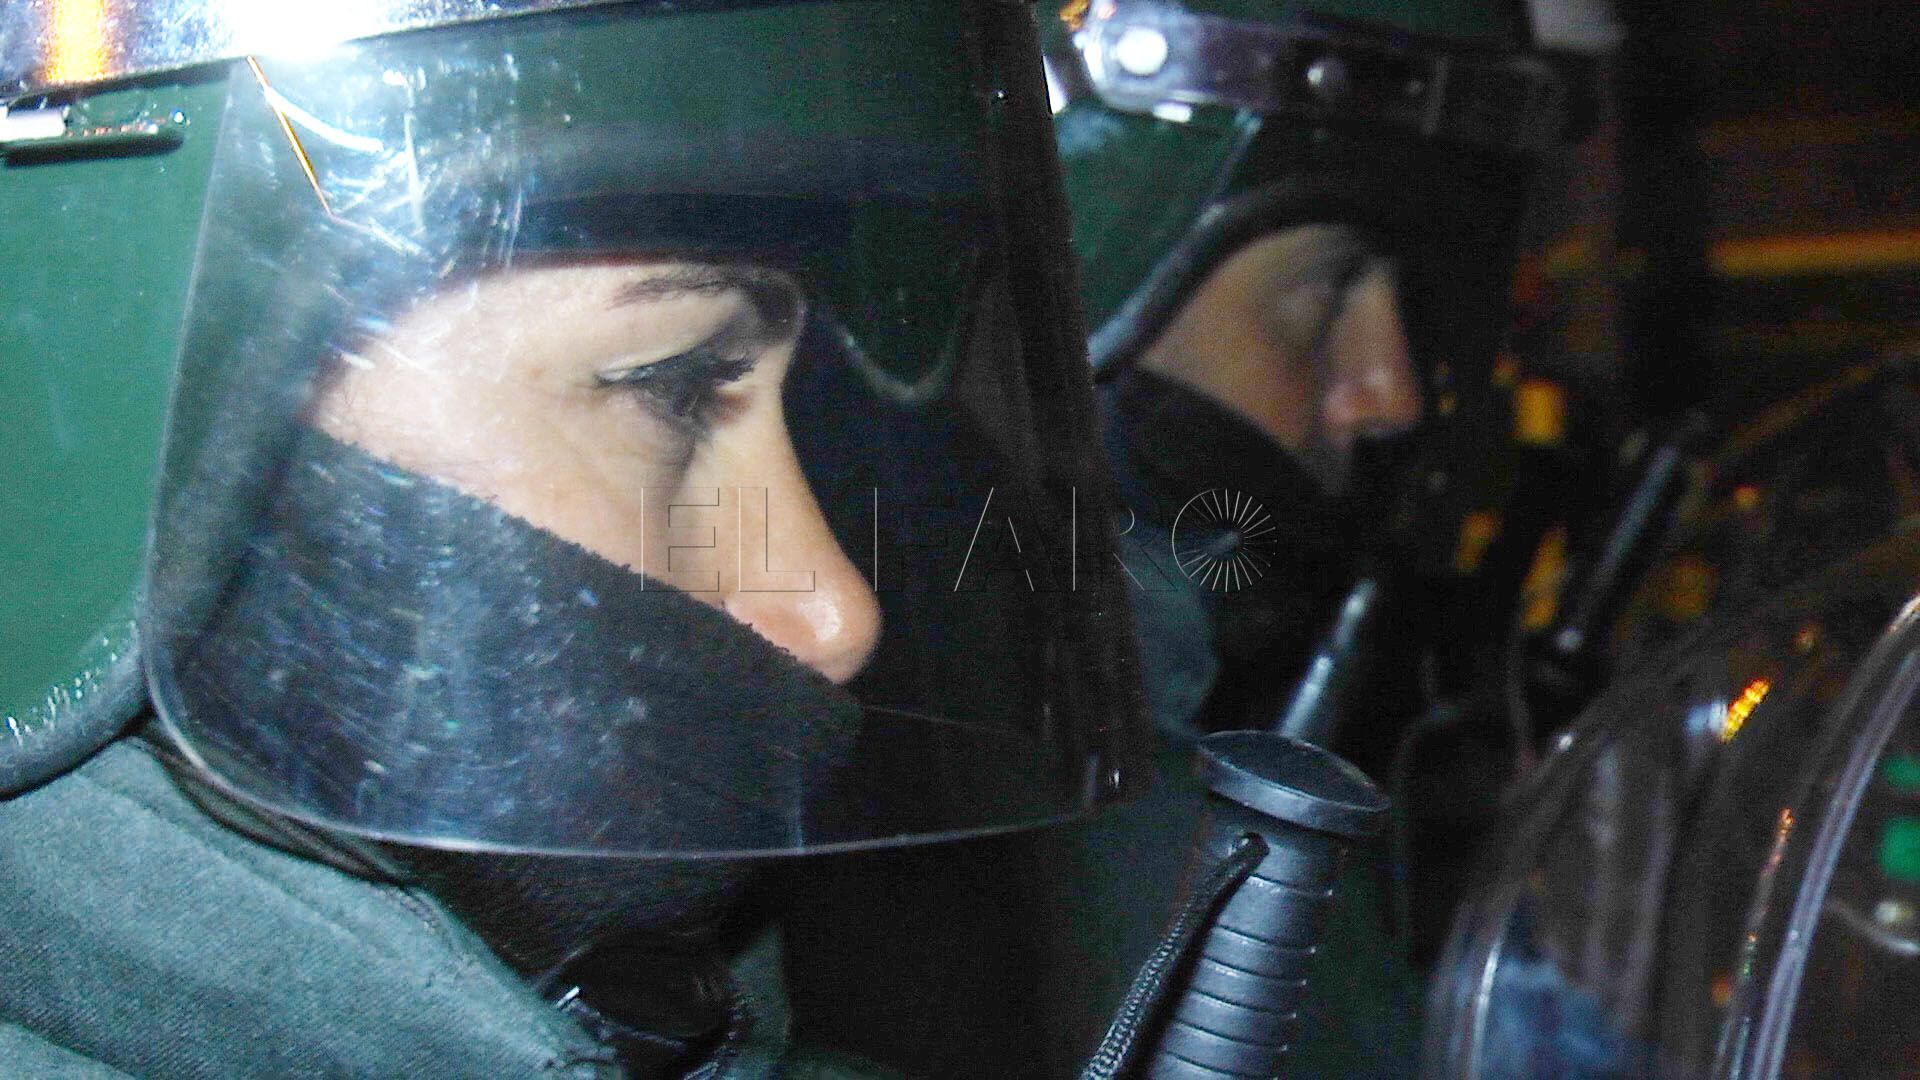 guardia-civil-ceuta-grs-usecic-9